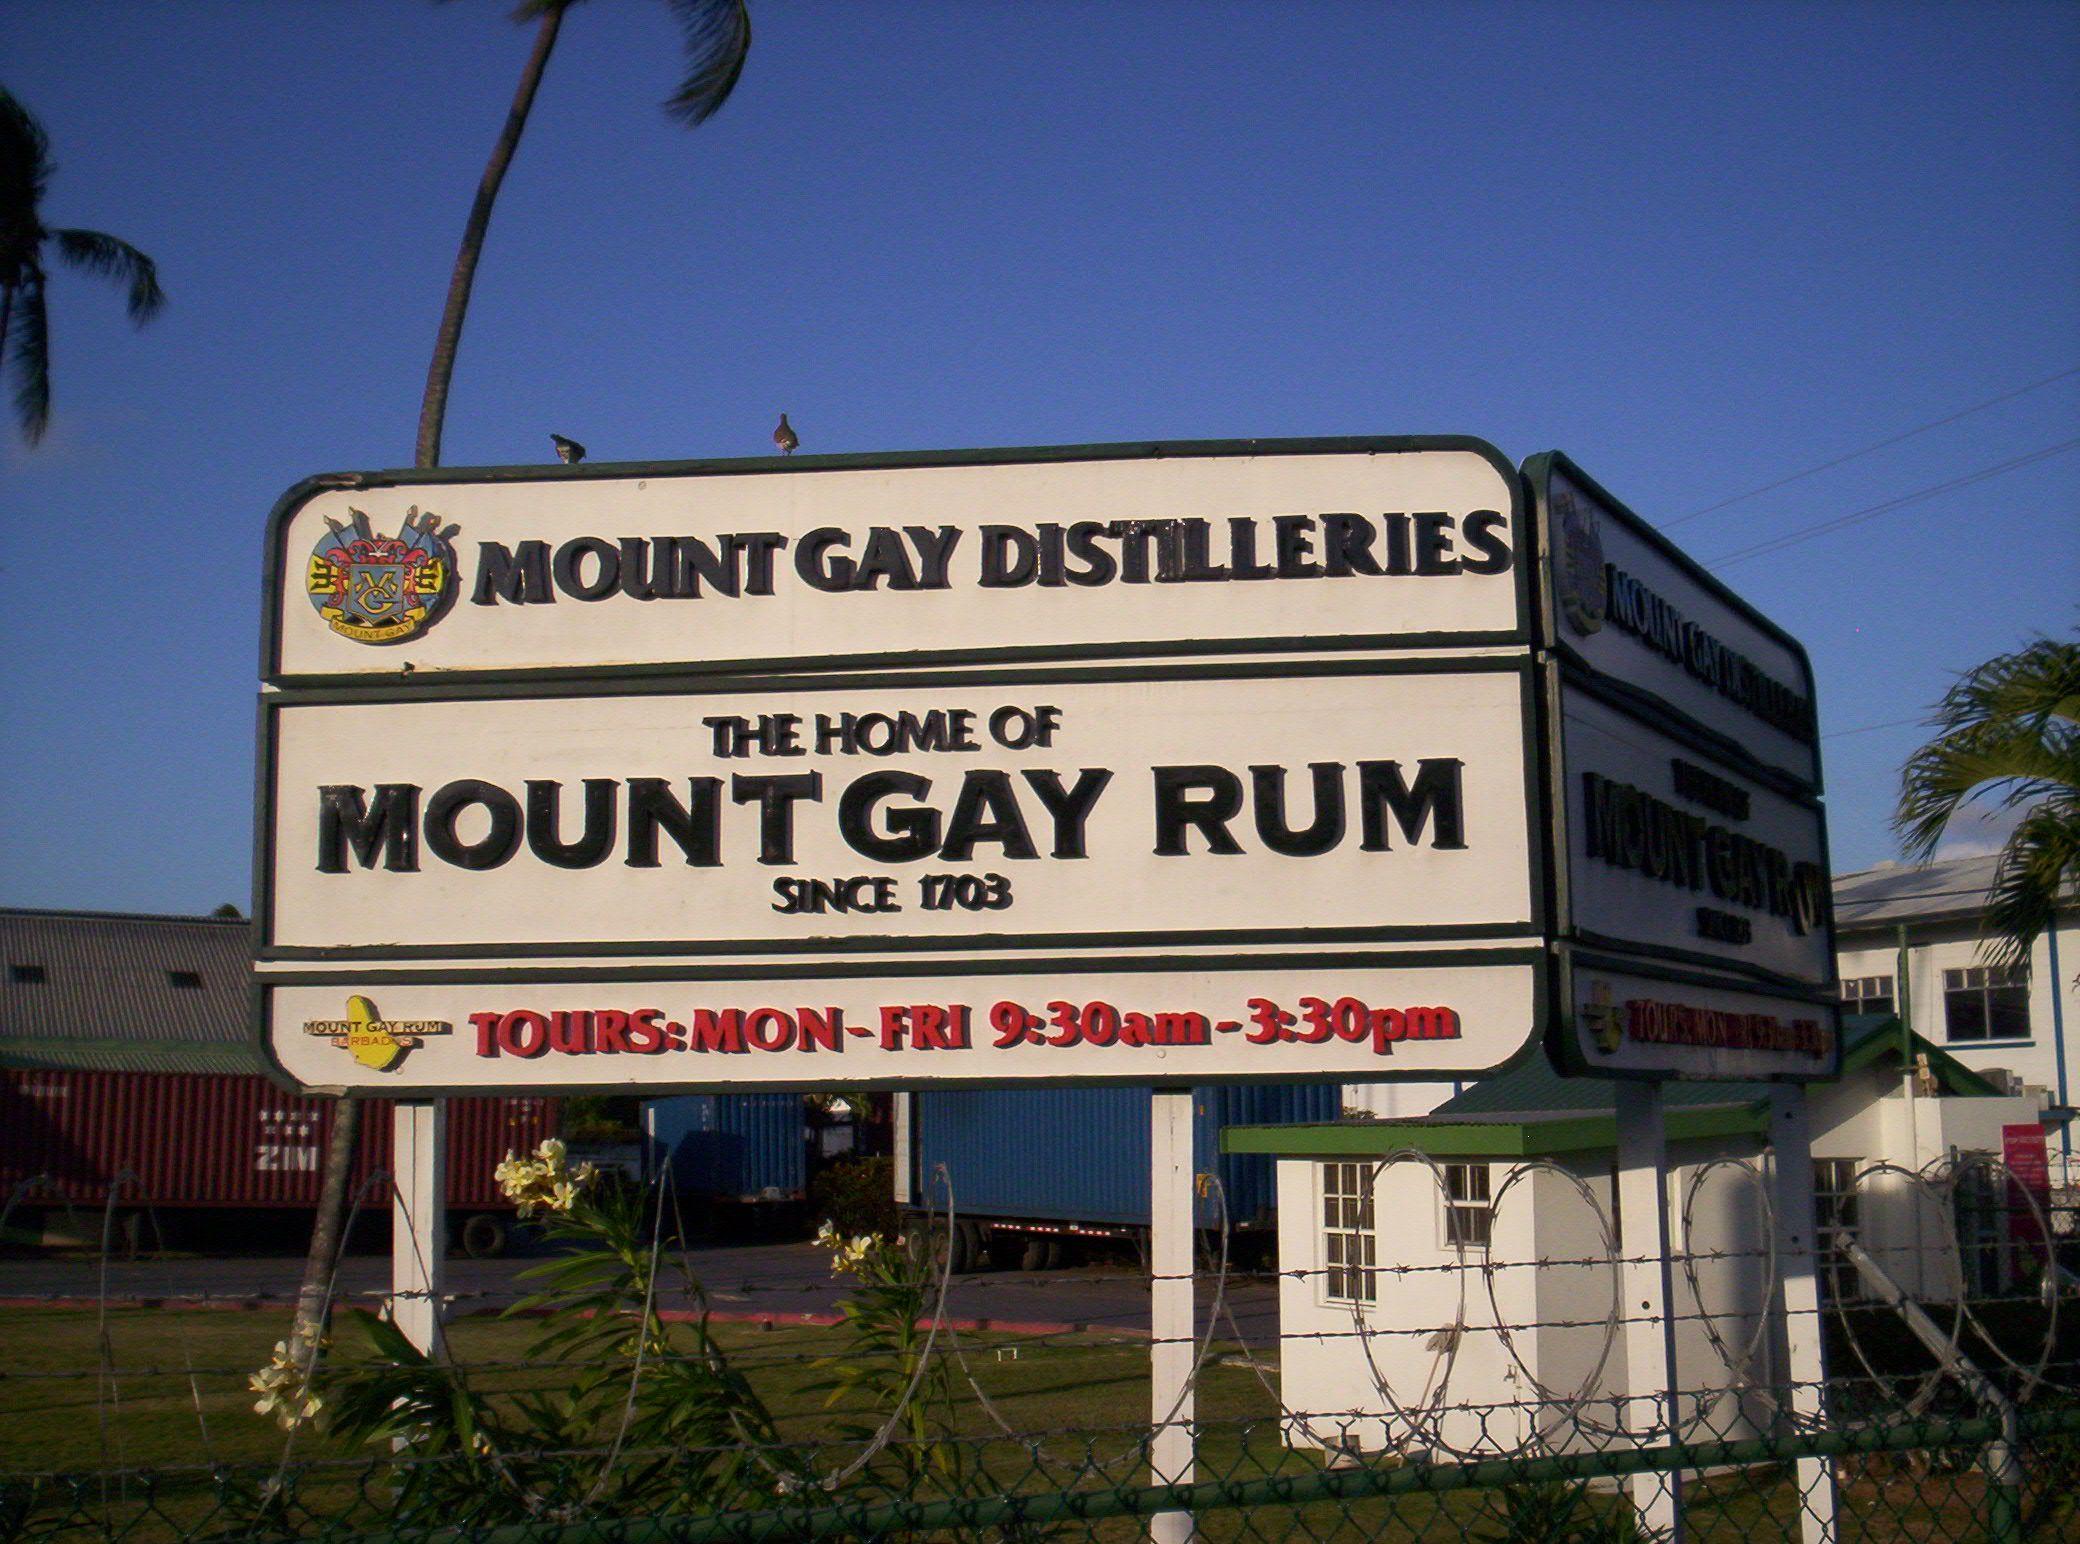 Mount Gay Distilleries